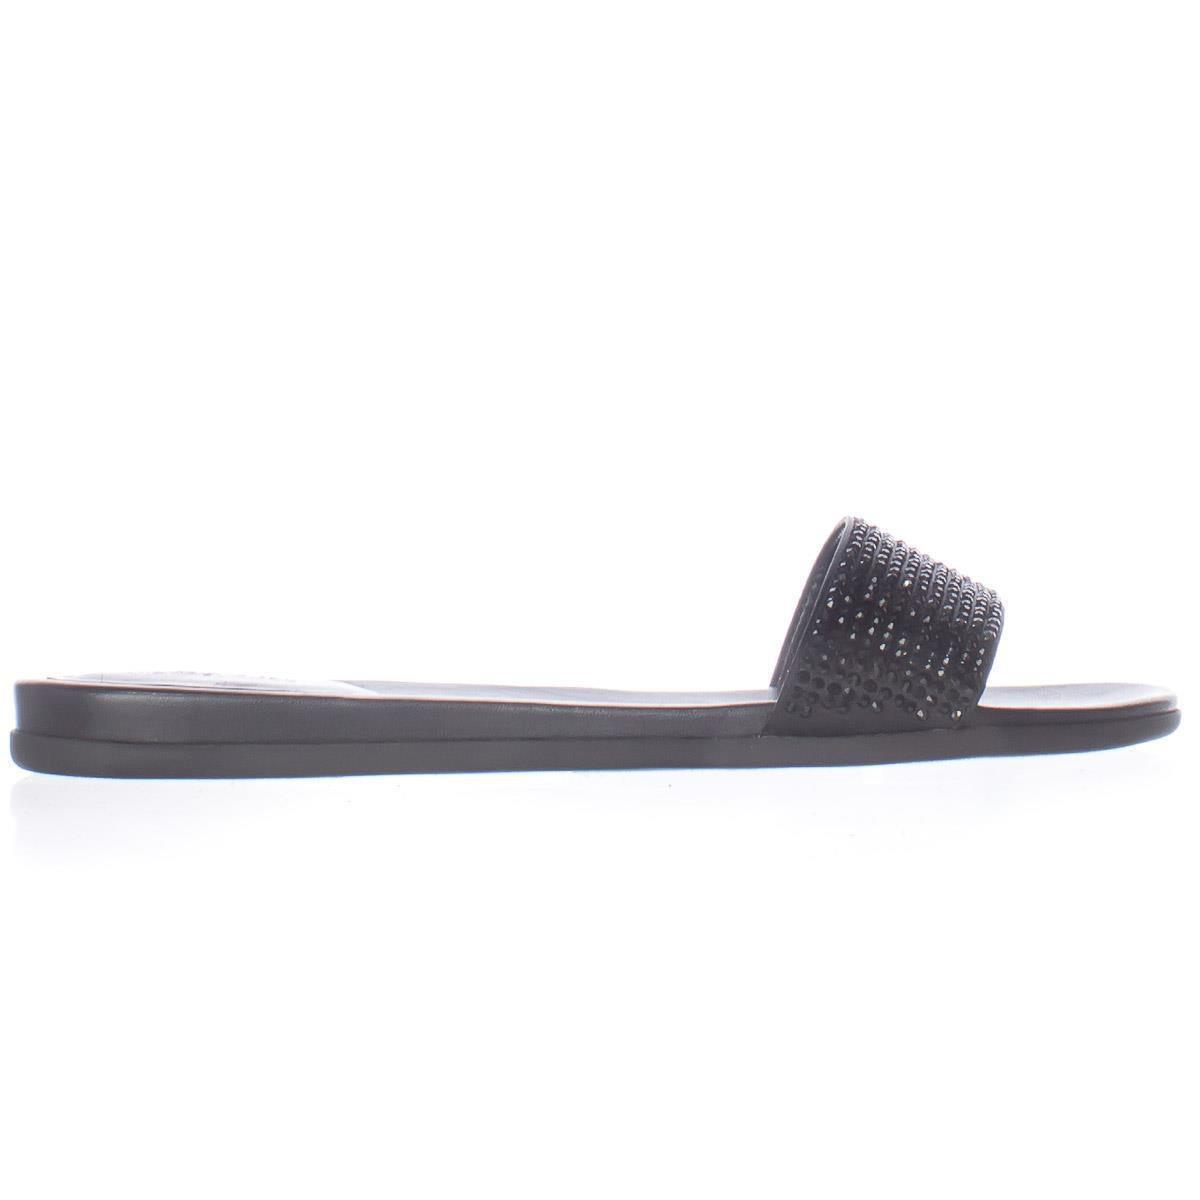 b7a6a2e58eb5 Lyst - Michael Kors Michael Eleanor Studded Slide Sandals in Black